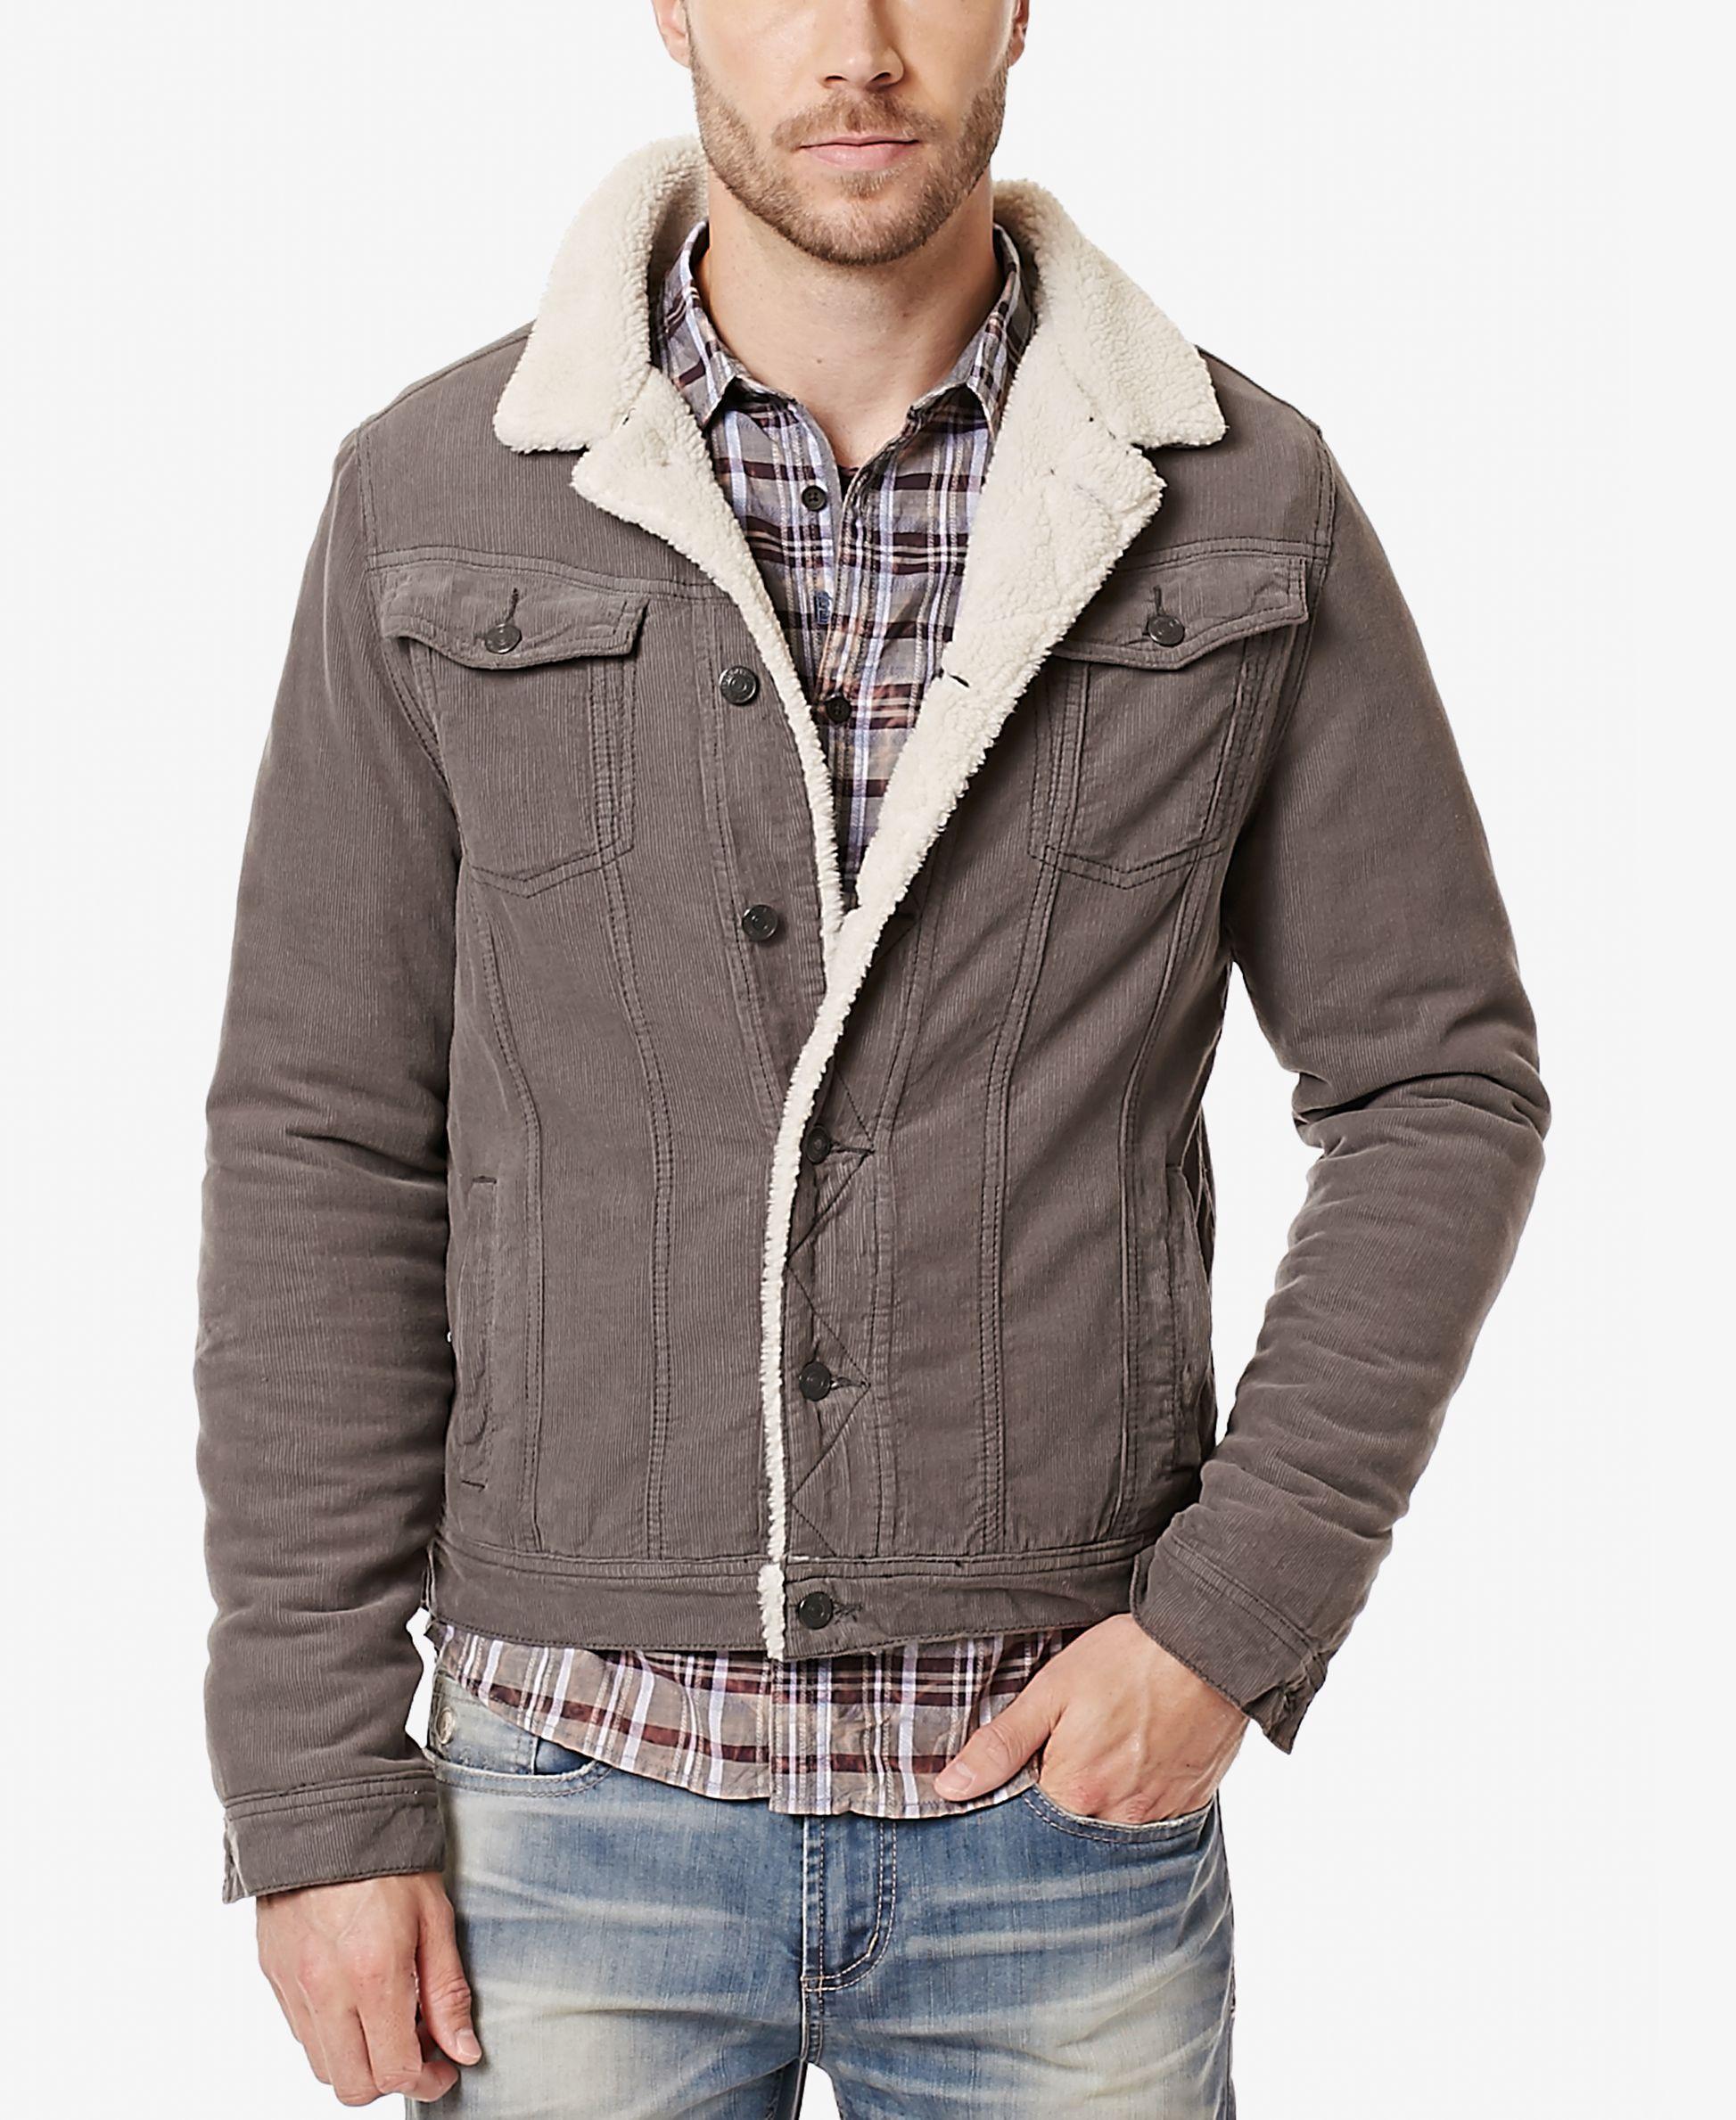 Buffalo David Bitton Men S Joe Jacket With Faux Fur Lining Jackets Mens Jackets Corduroy Jacket [ 2378 x 1947 Pixel ]